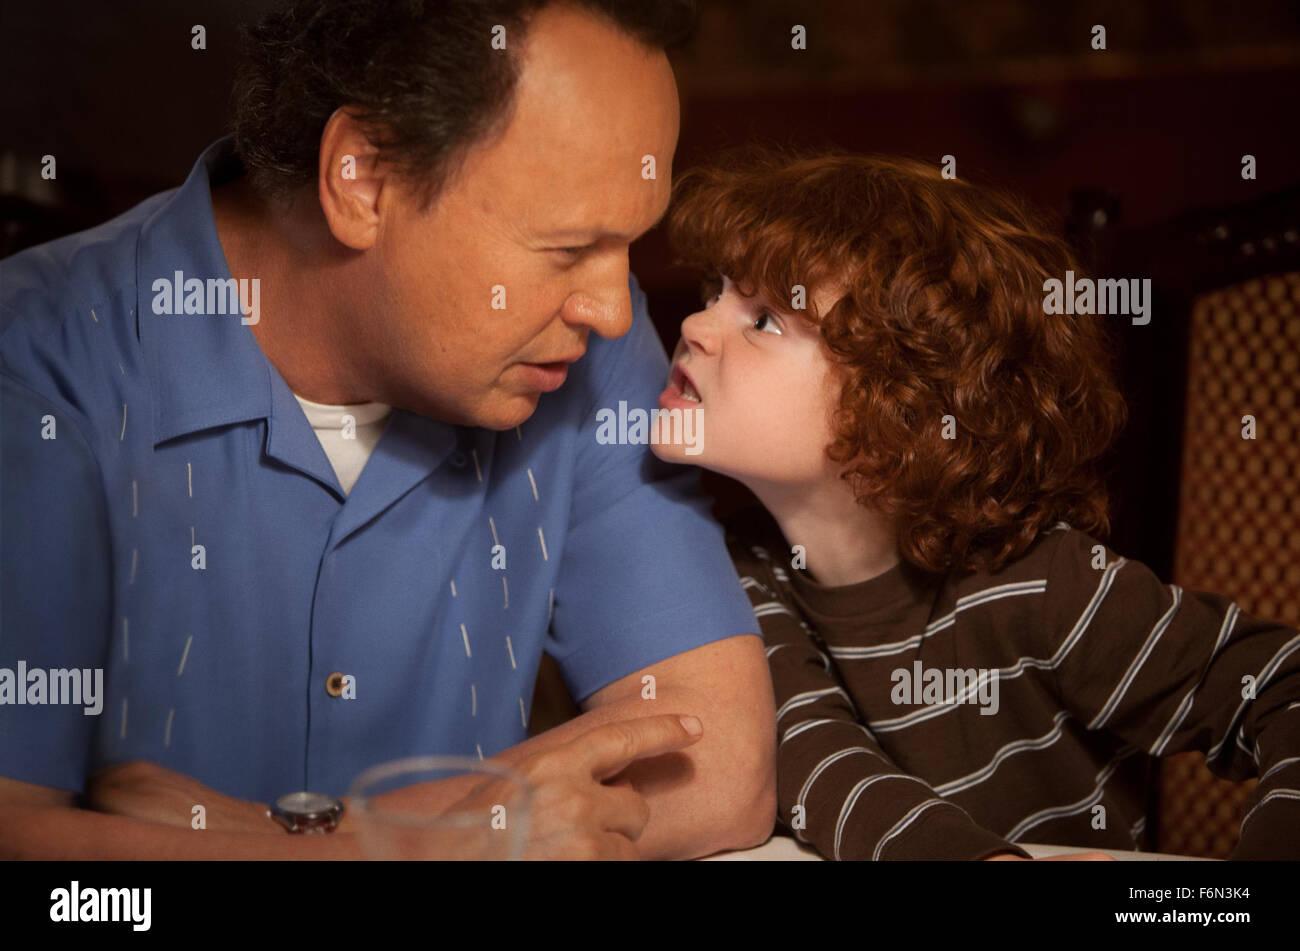 RELEASE DATE: December 25, 2012 TITLE: Parental Guidance STUDIO: Twentieth Century Fox Films DIRECTOR: Andy Fickman - Stock Image